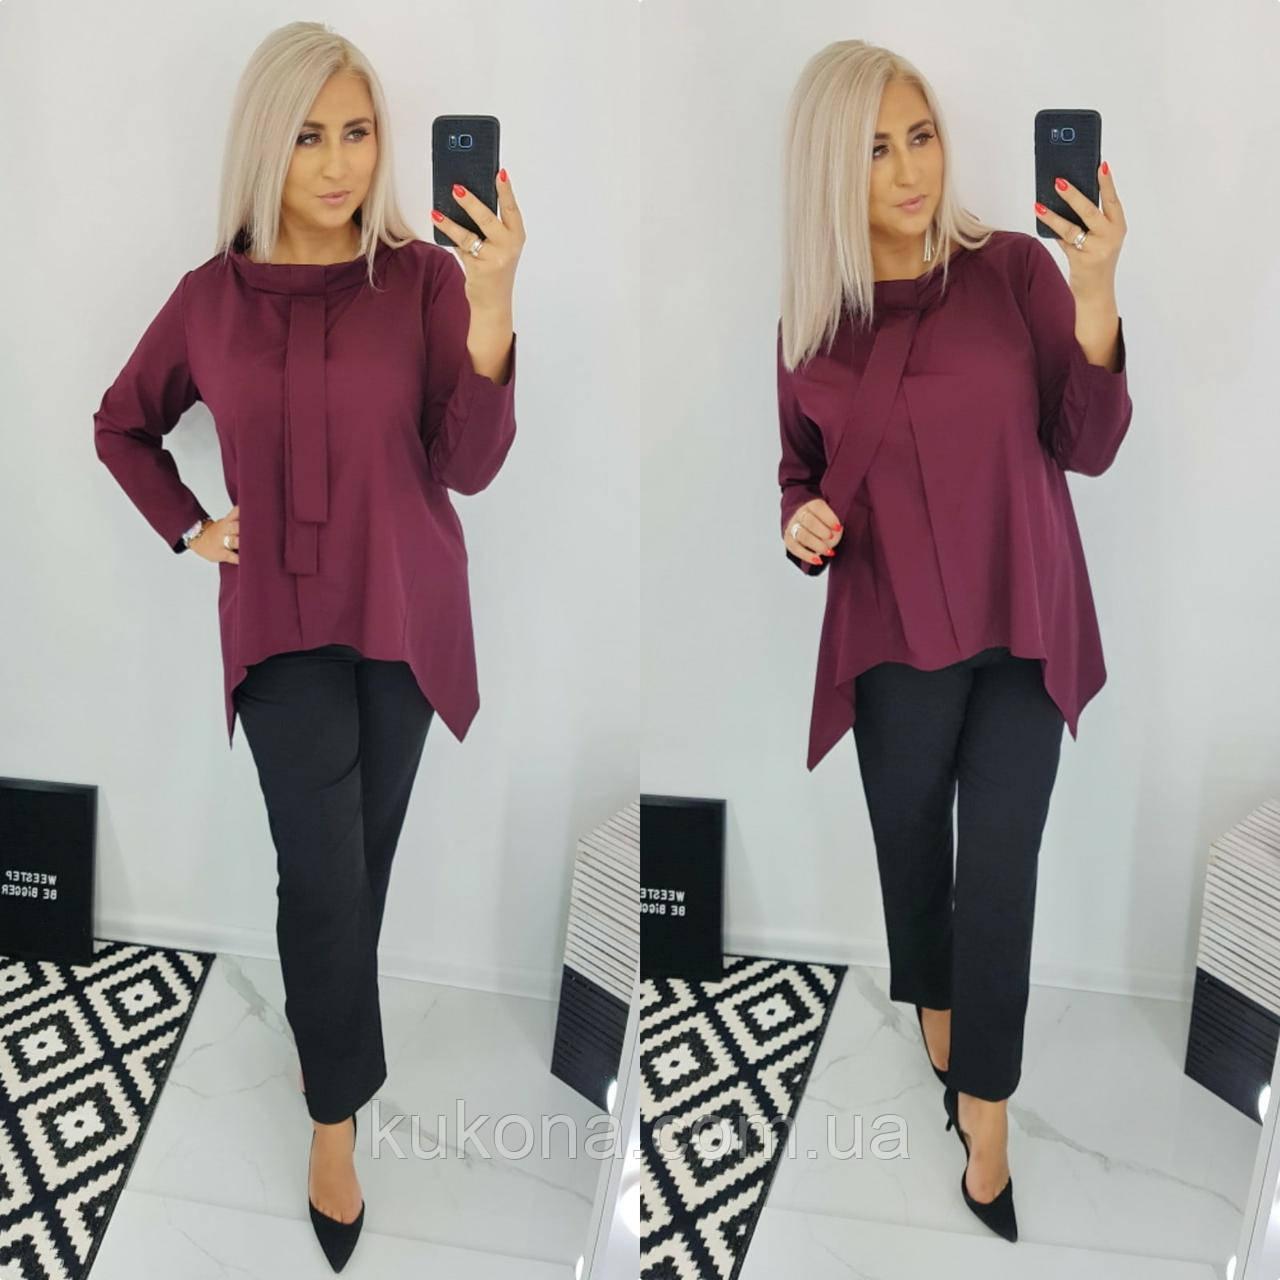 Костюм женский батал (блуза+брюки). Размер: 48, 50, 52, 54. Цвет: чёрный, марсала.